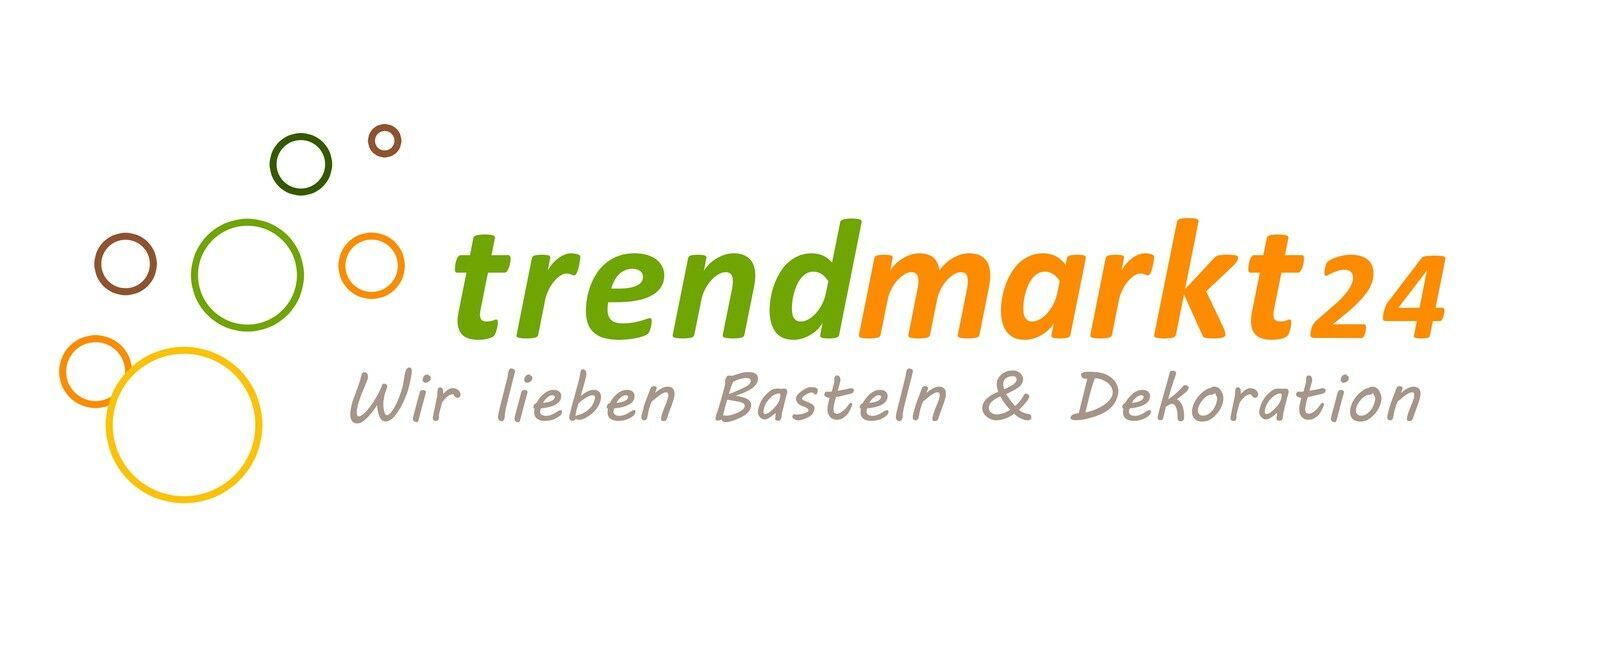 trendmarkt24